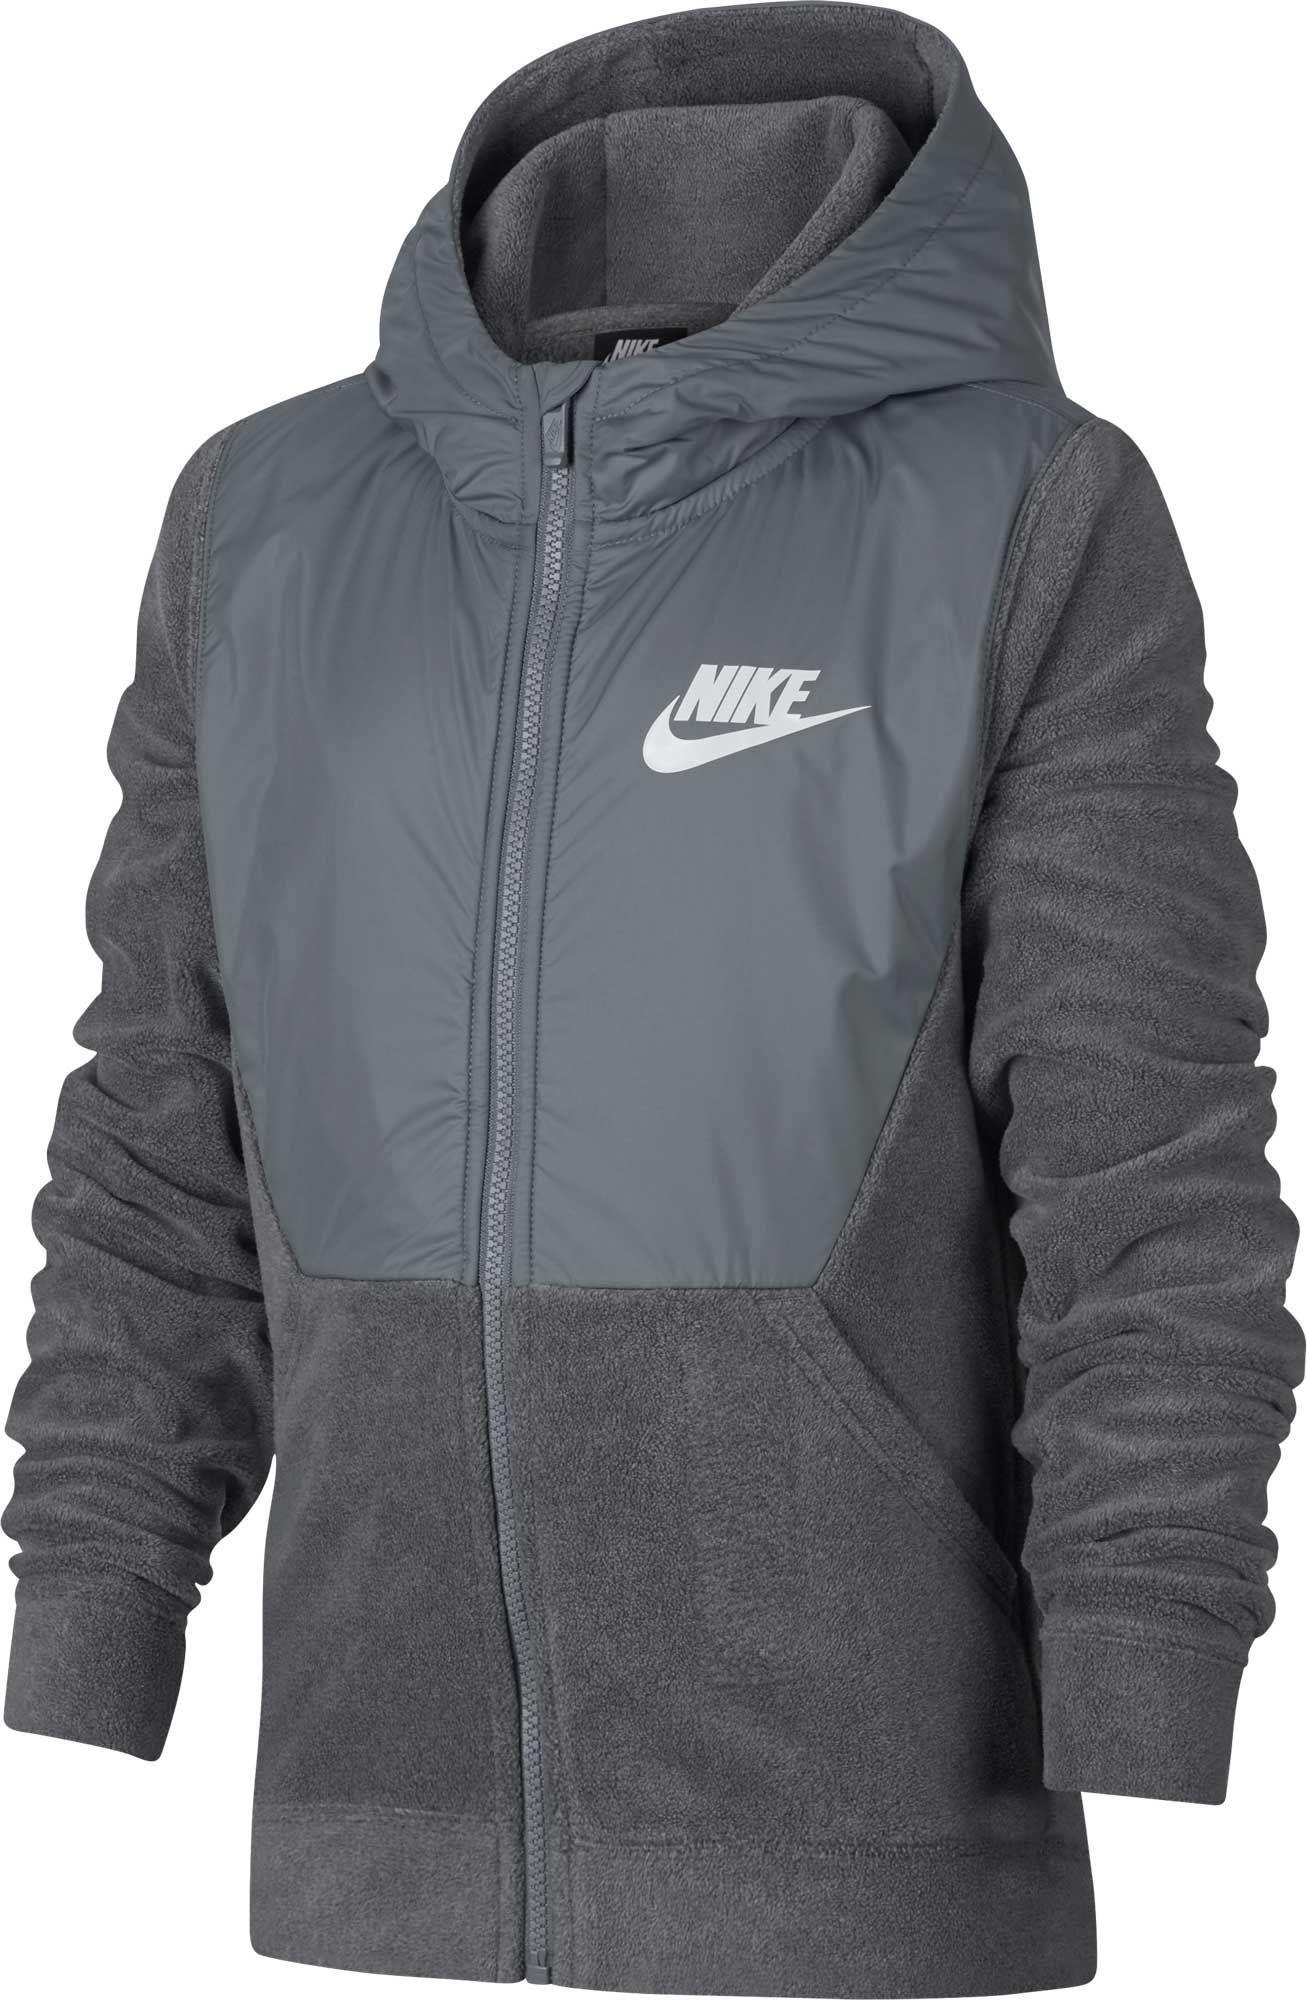 39037f8b4 Nike Boys' Sportswear Polar Fleece Full-Zip Hoodie, Size: XL, Carbon ...